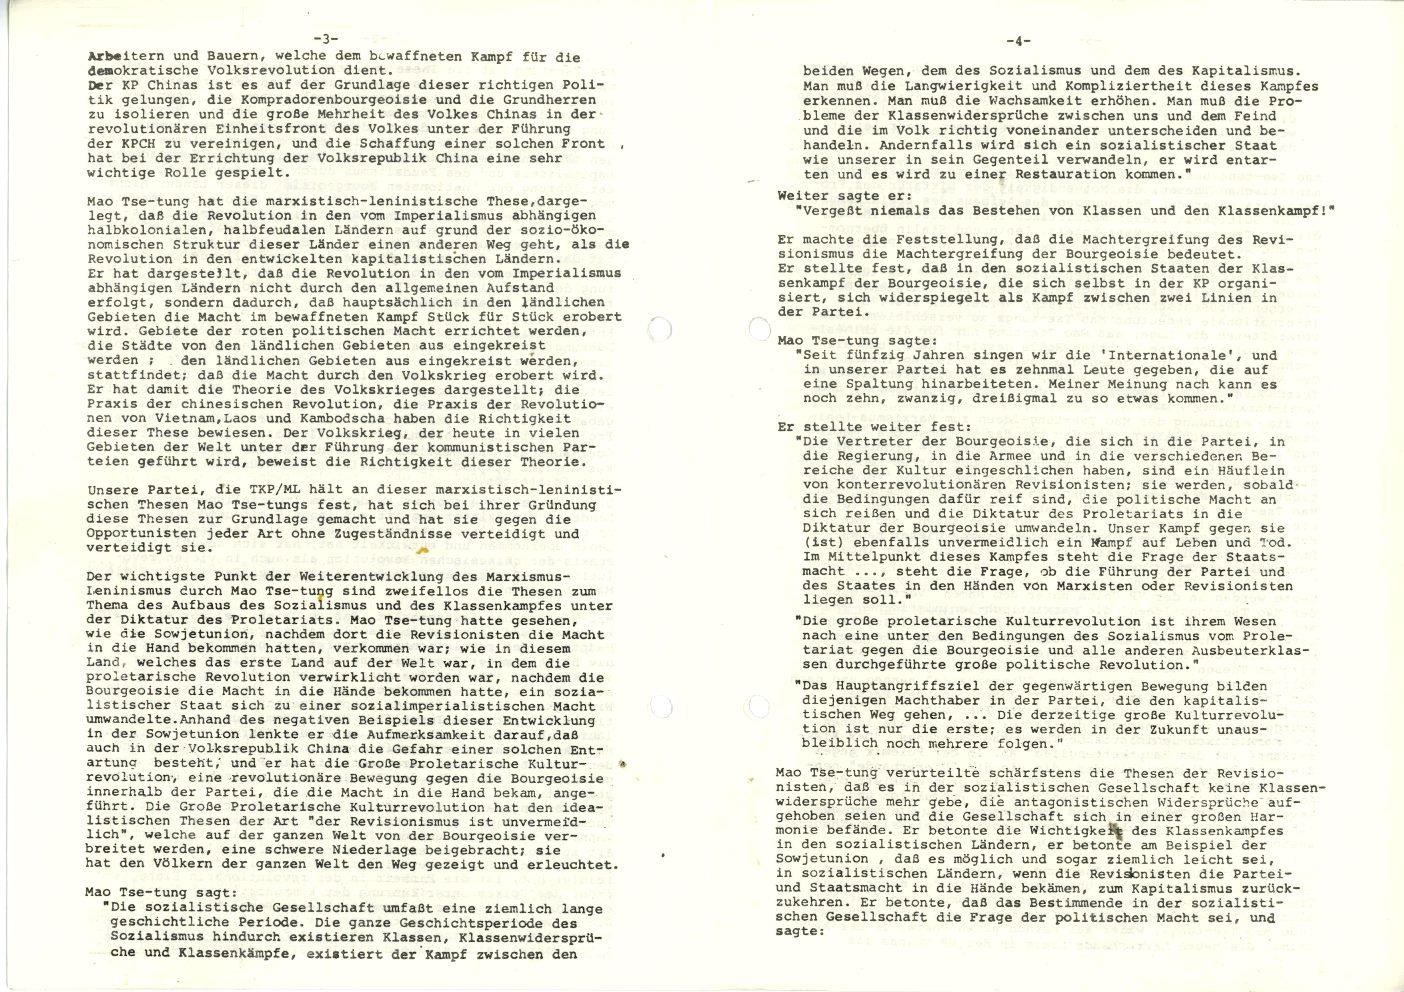 TKPML_1977_04_03